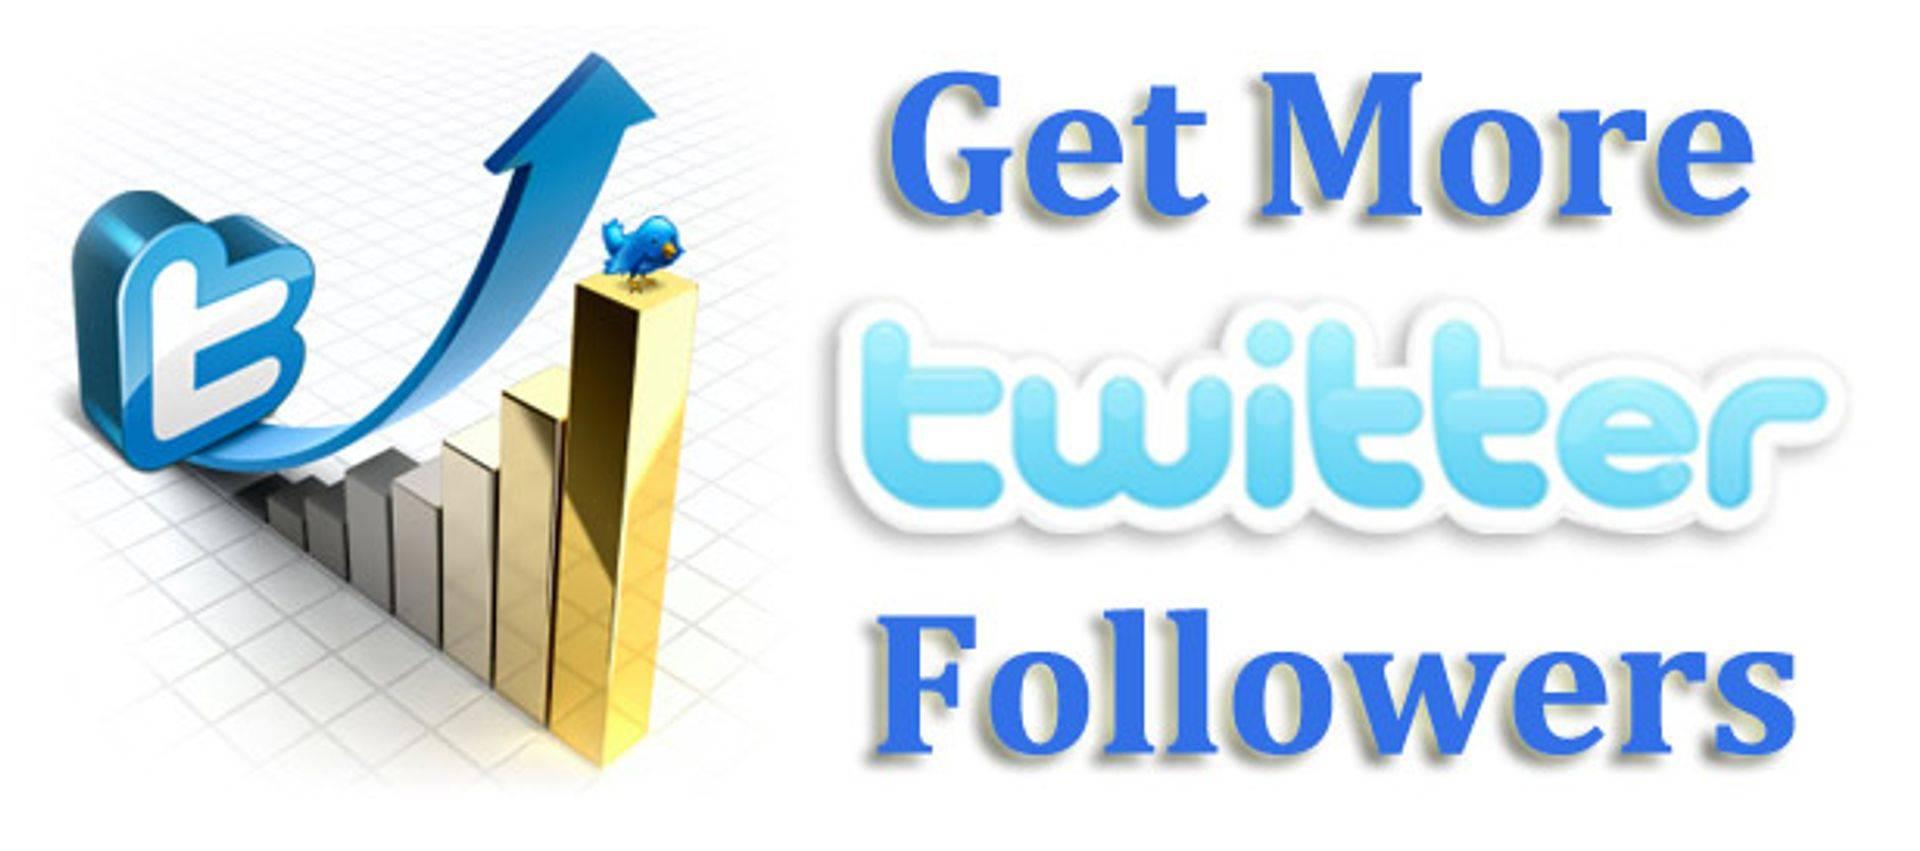 Twitter Shoutouts! Get more followers!